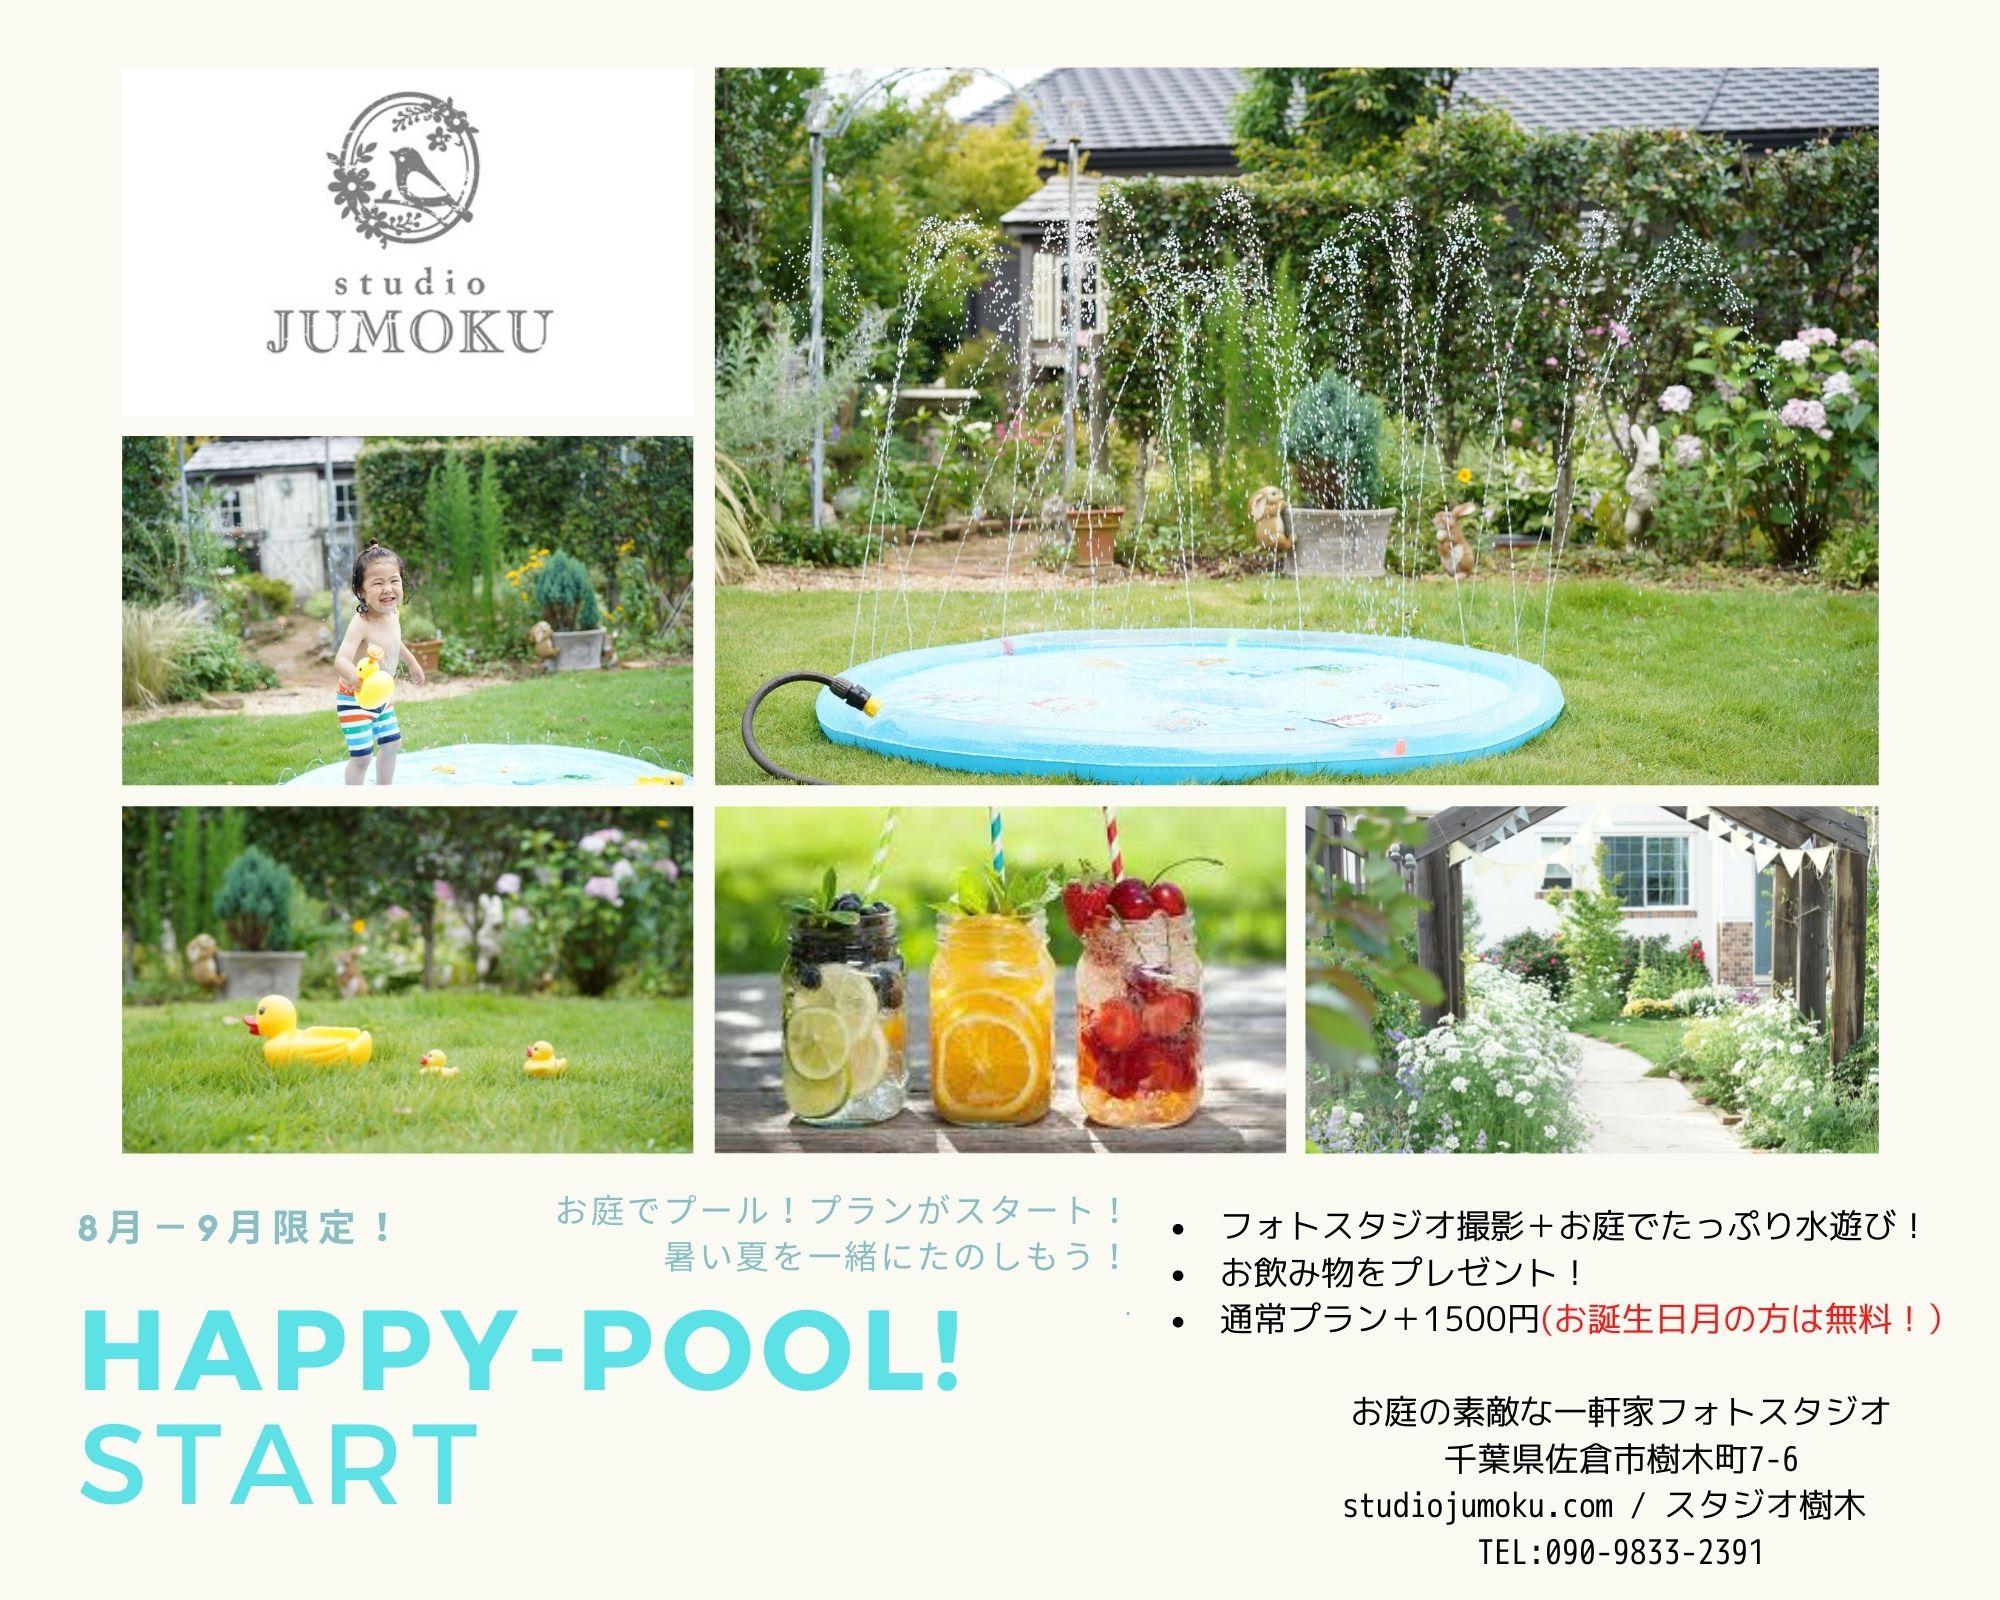 HAPPY POOL!が今年もスタート!